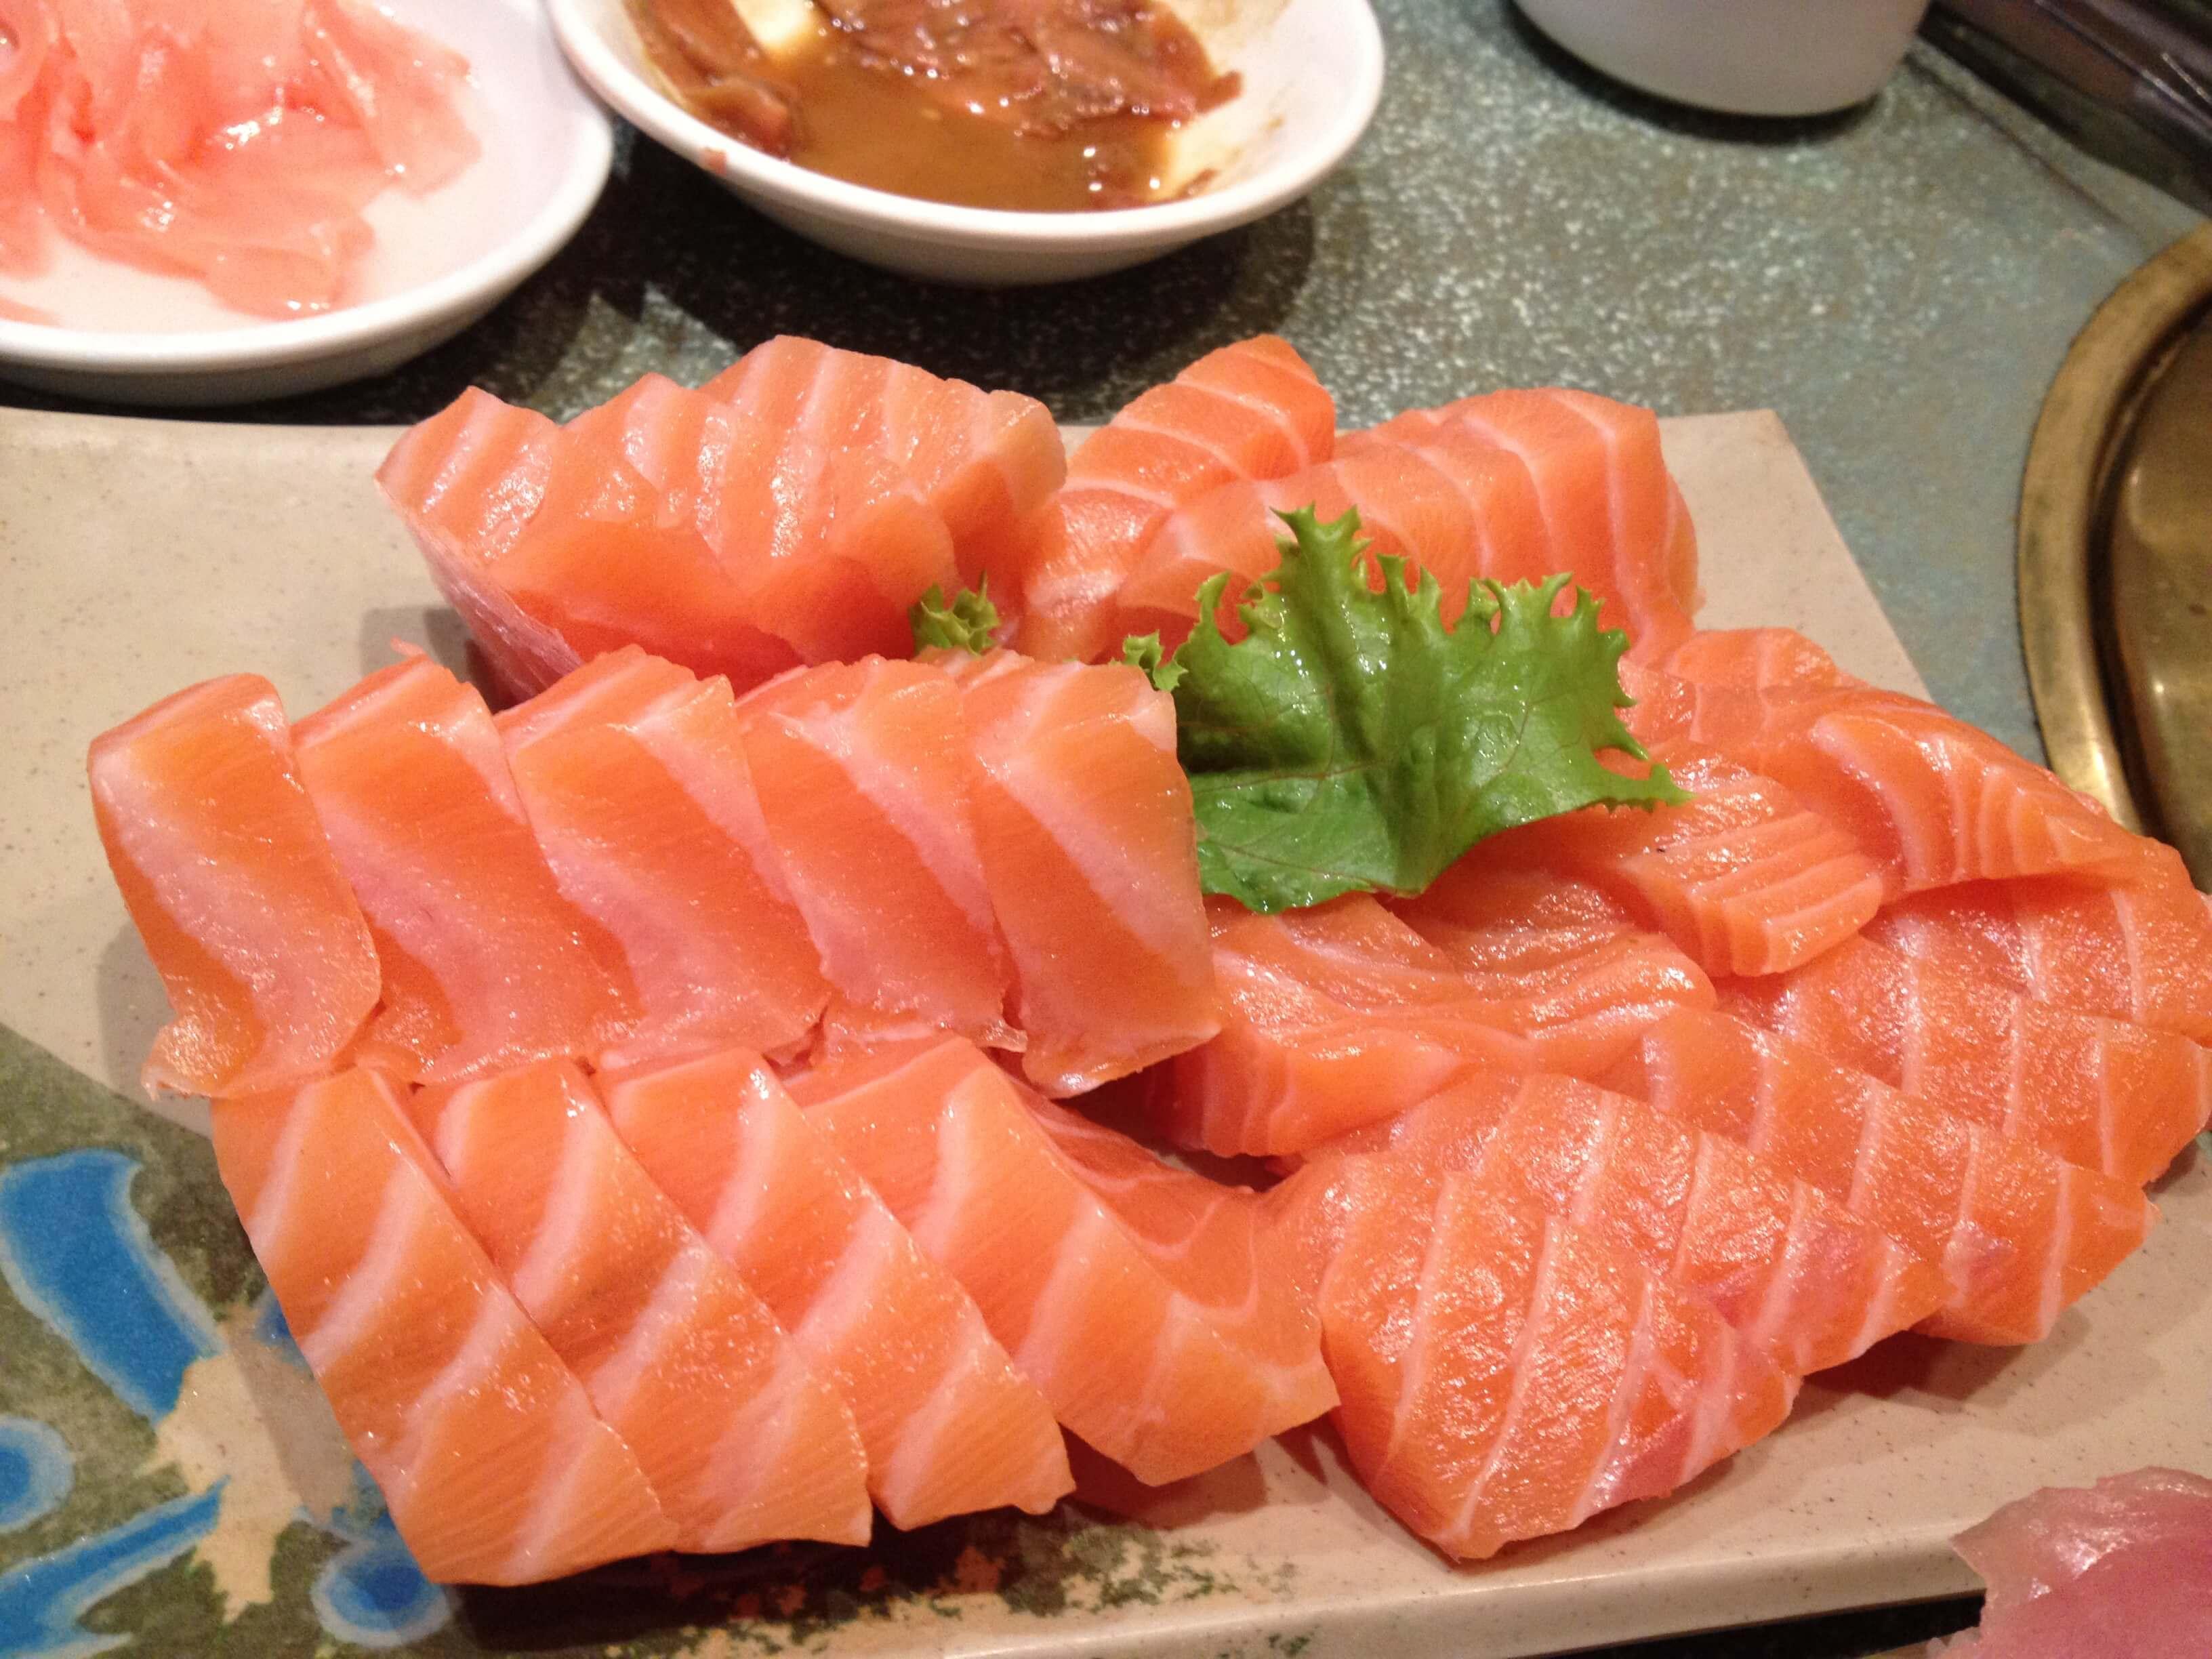 salmon food widescreen hd wallpaper 66883